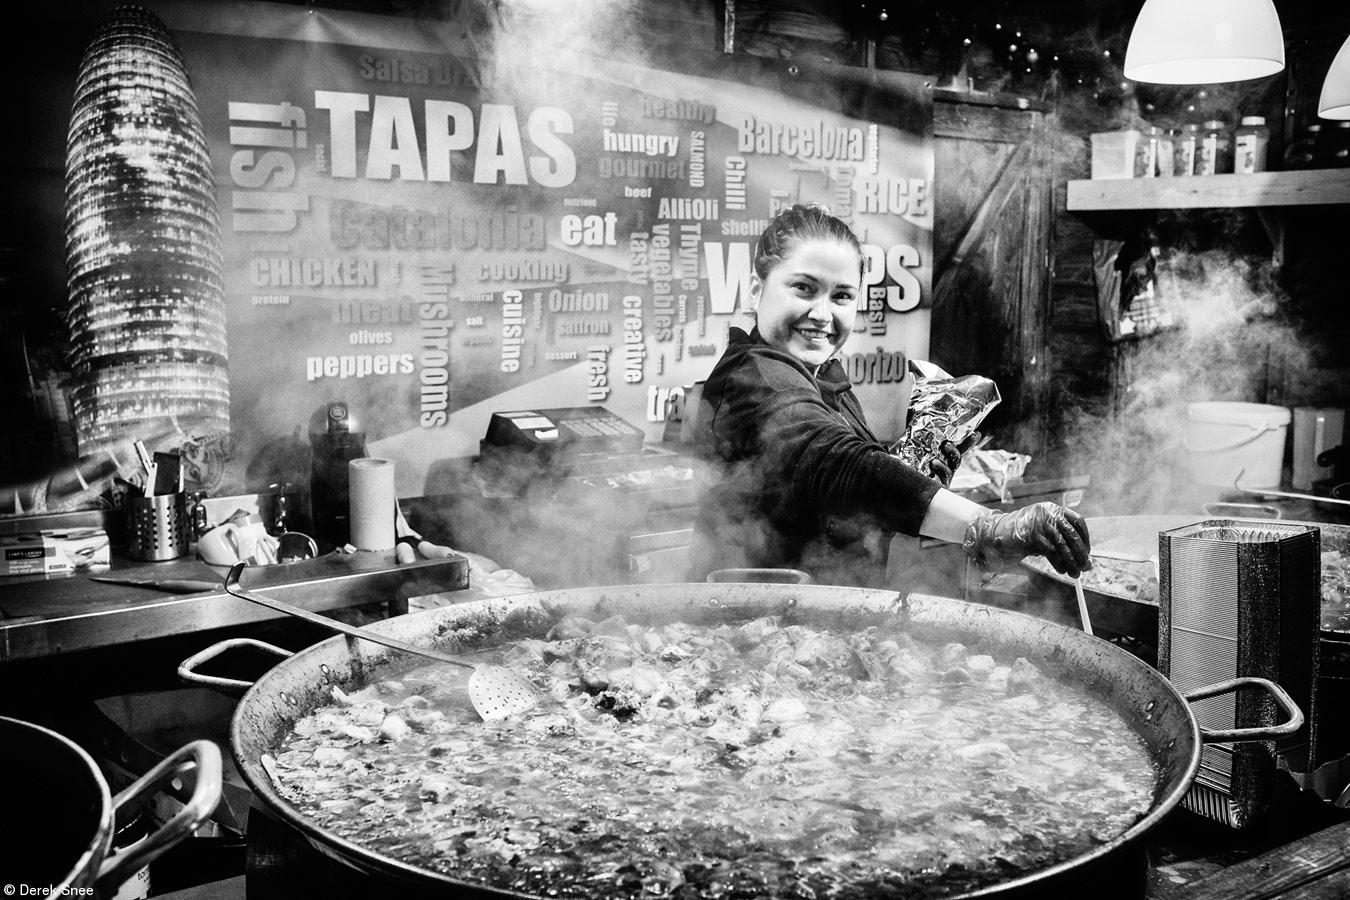 Тапас-Апон-Тайн, © Дерек Снеи, Великобритания, 1-е место, категория «Фуд-приключения», Marks & Spencer» (британские фестивали), Фотоконкурс Pink Lady Food